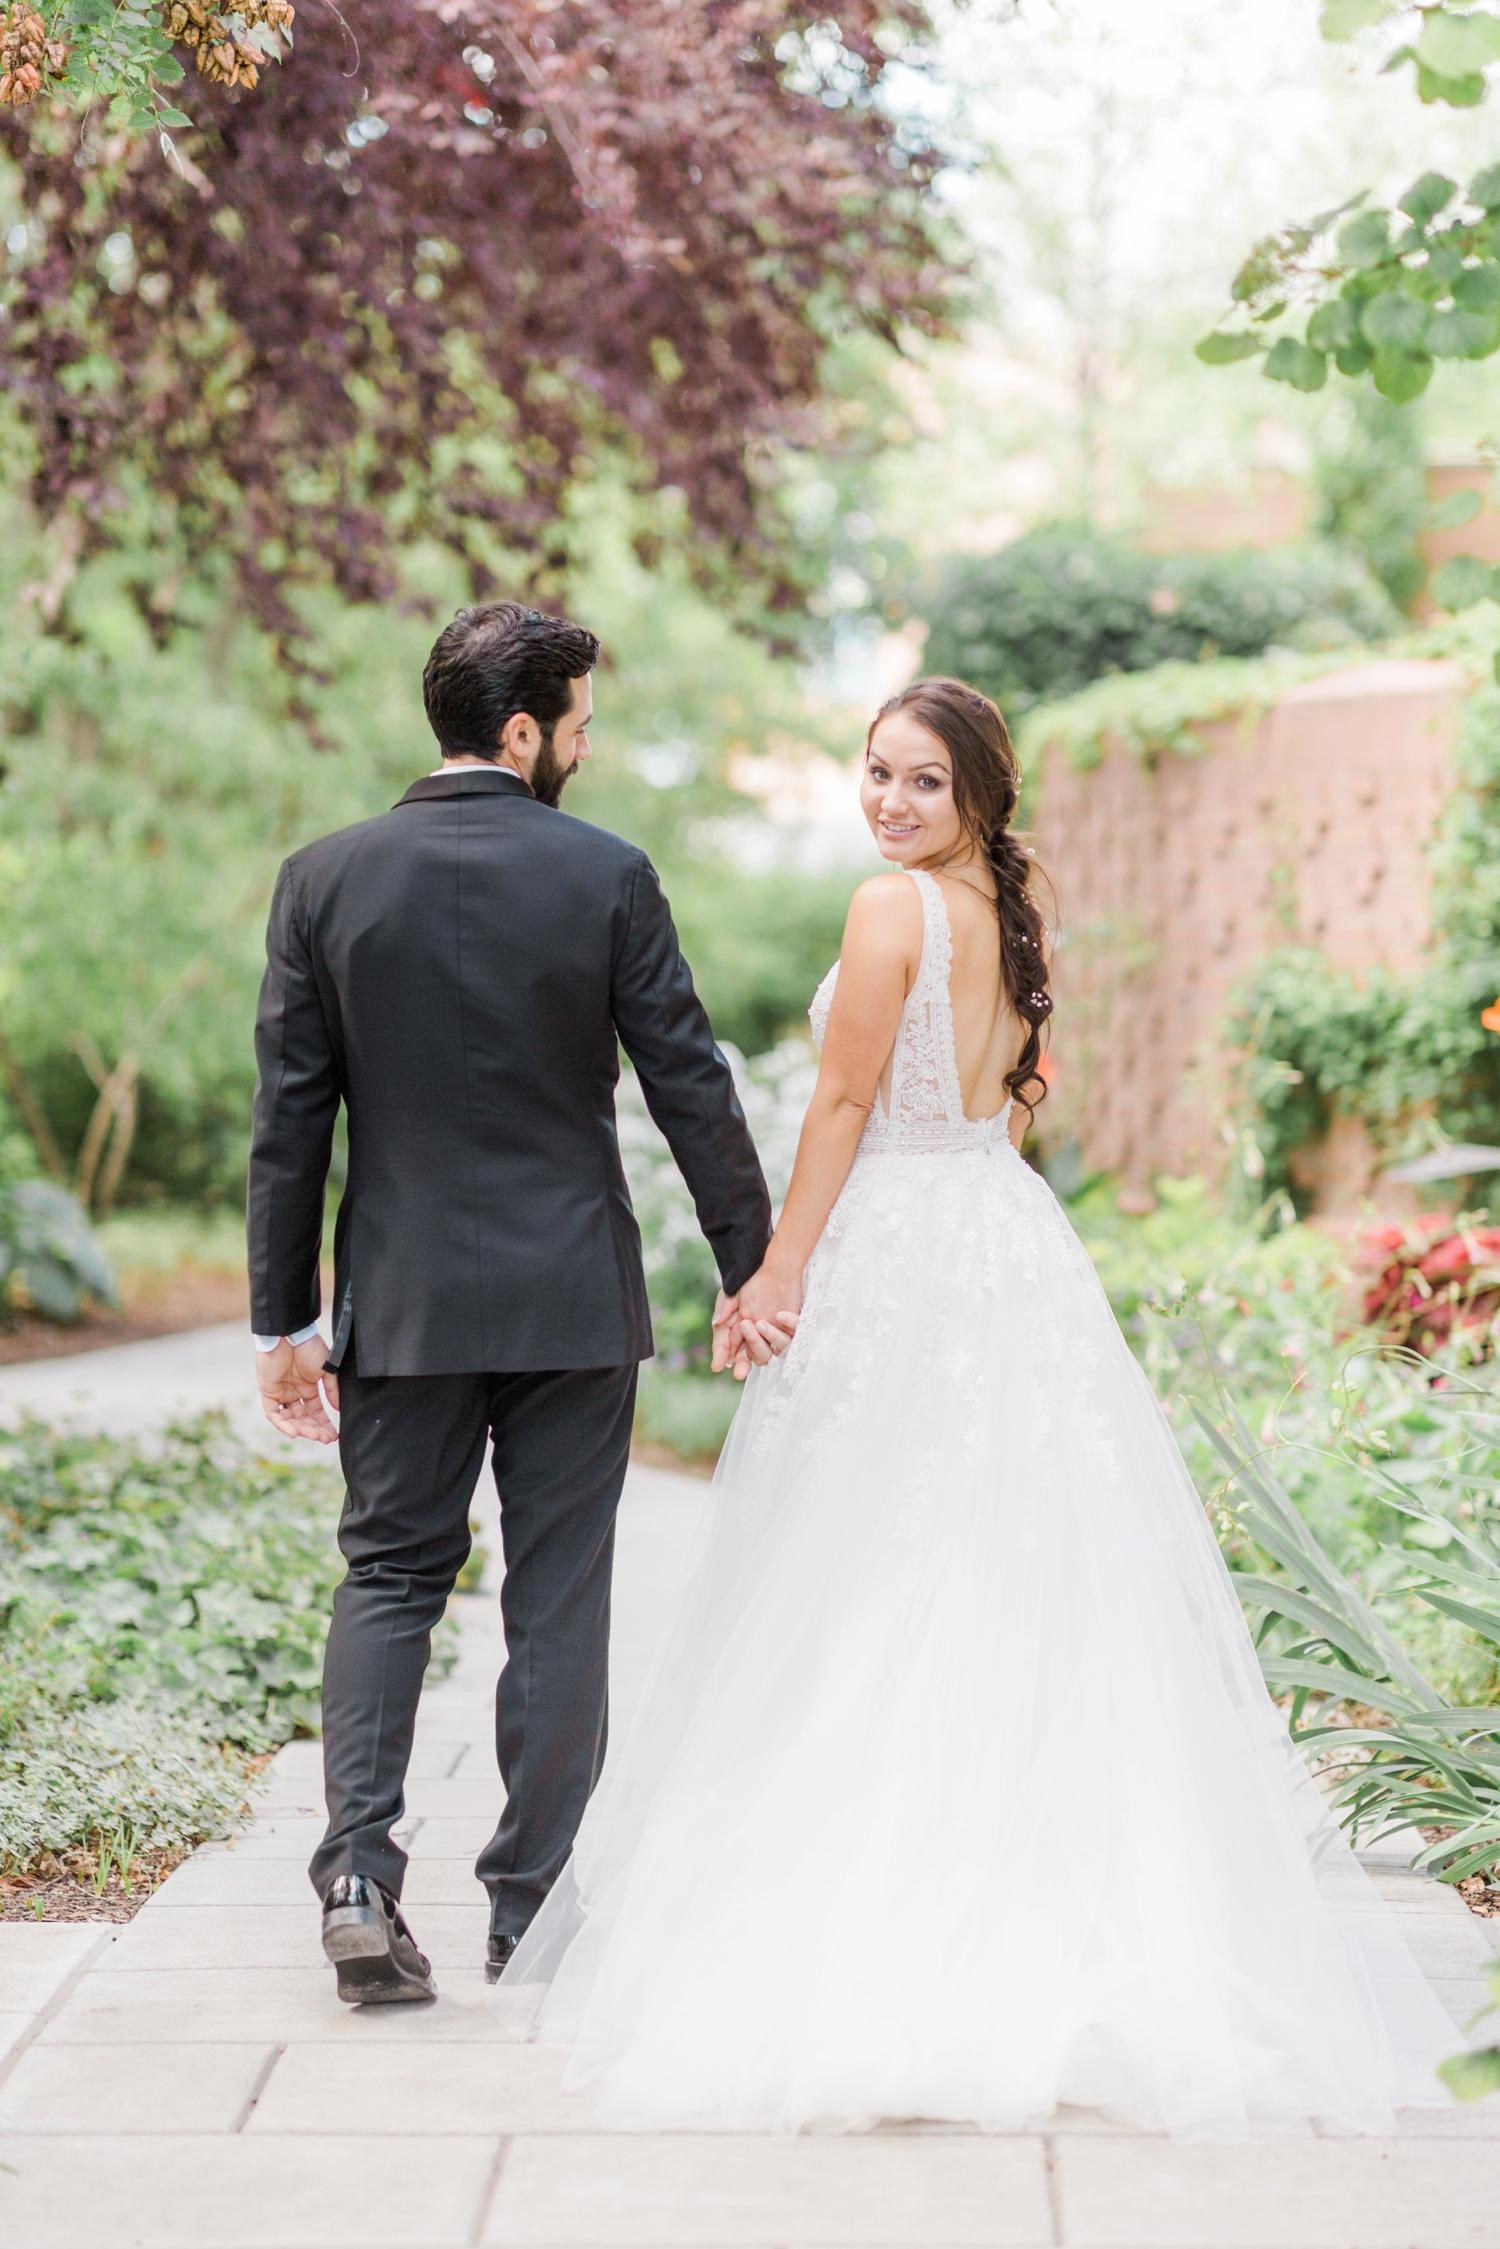 fine-art-indianapolis-wedding-photography_6345.jpg